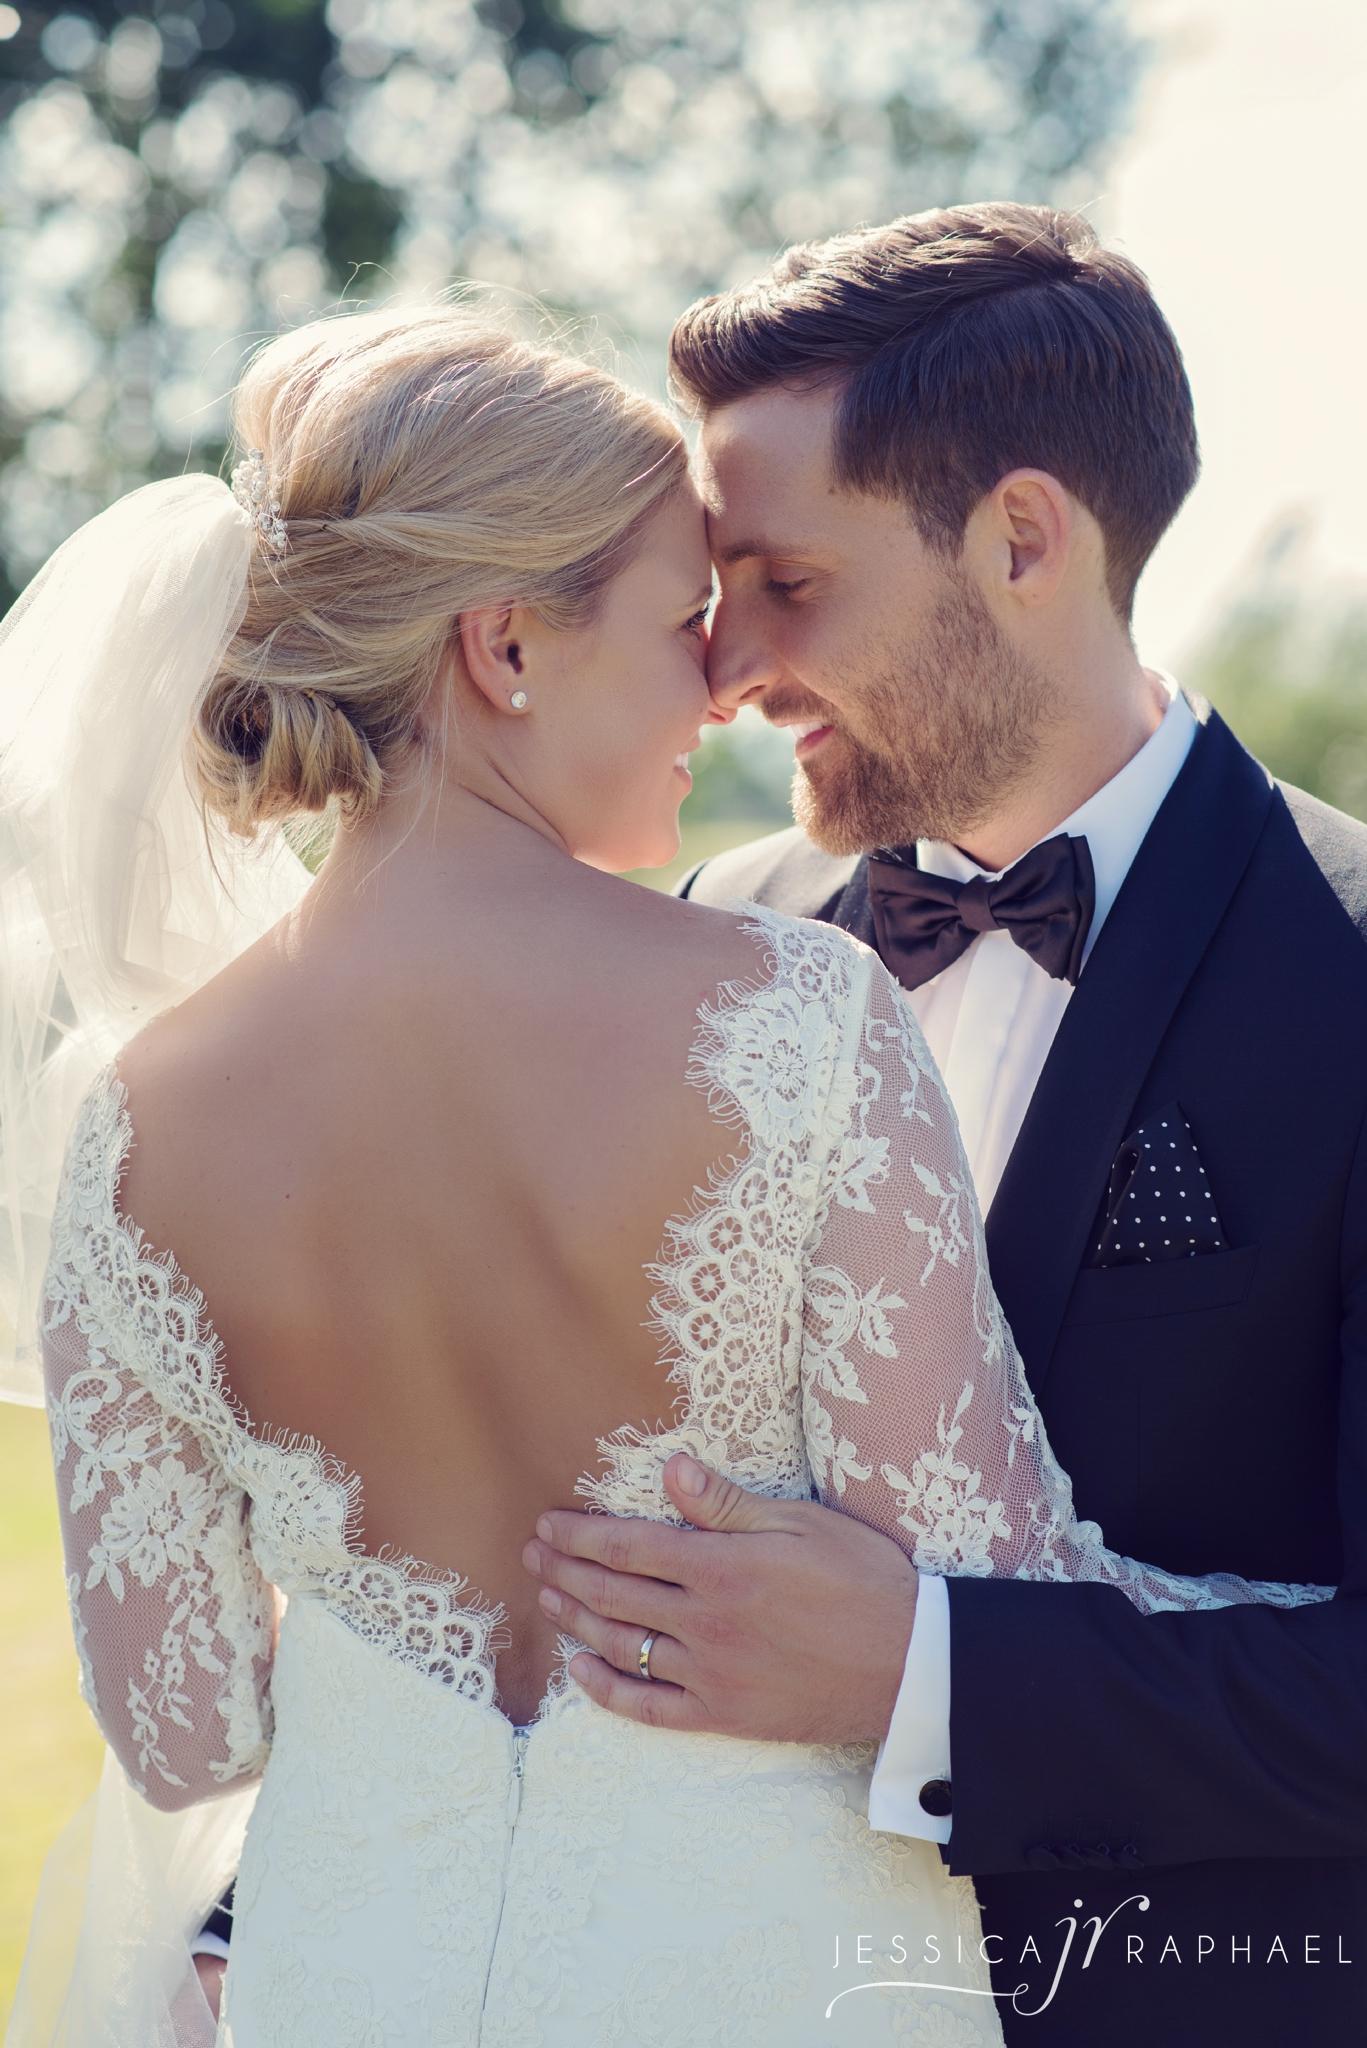 or come shine. I love each & every wedding I photograph.